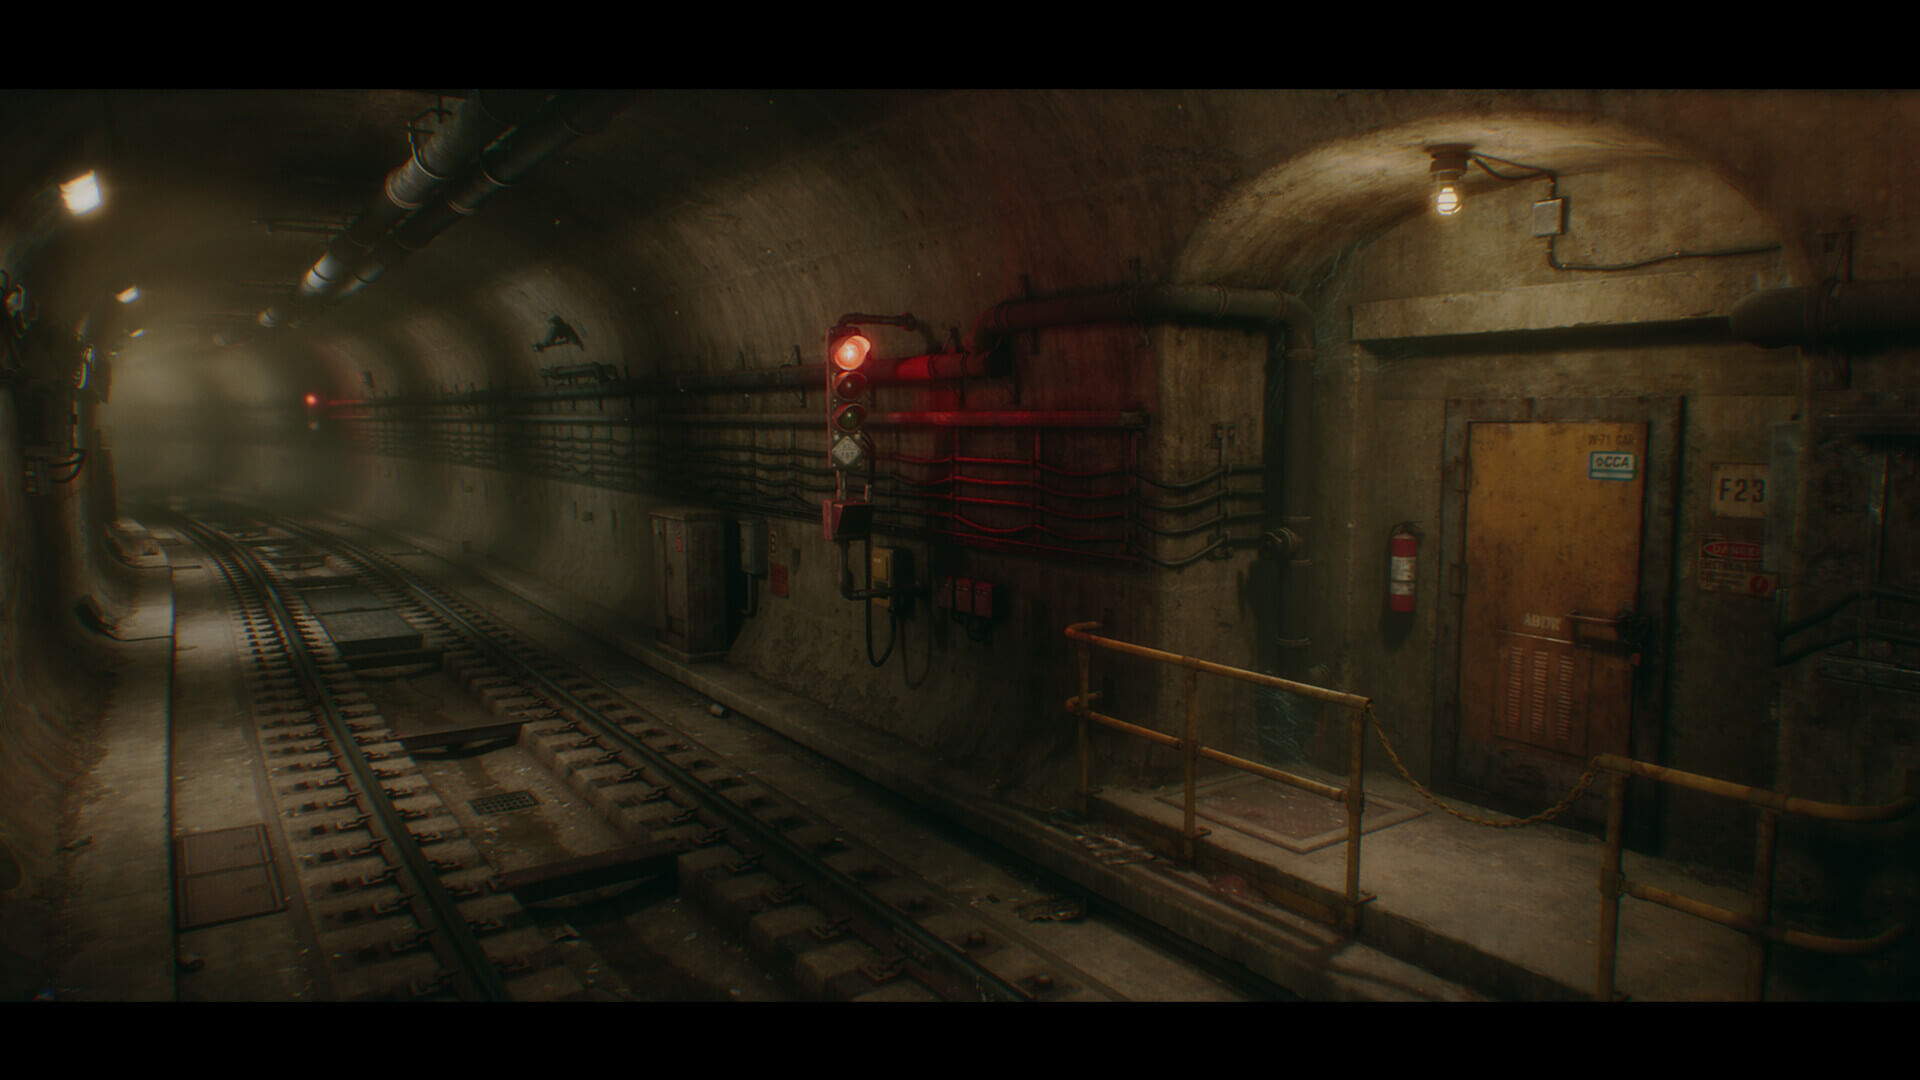 dekogon studios subwaytunnel screenshot05 - 【画像】『PS5』世代のゲームはこんな感じのグラフィックになるらしい